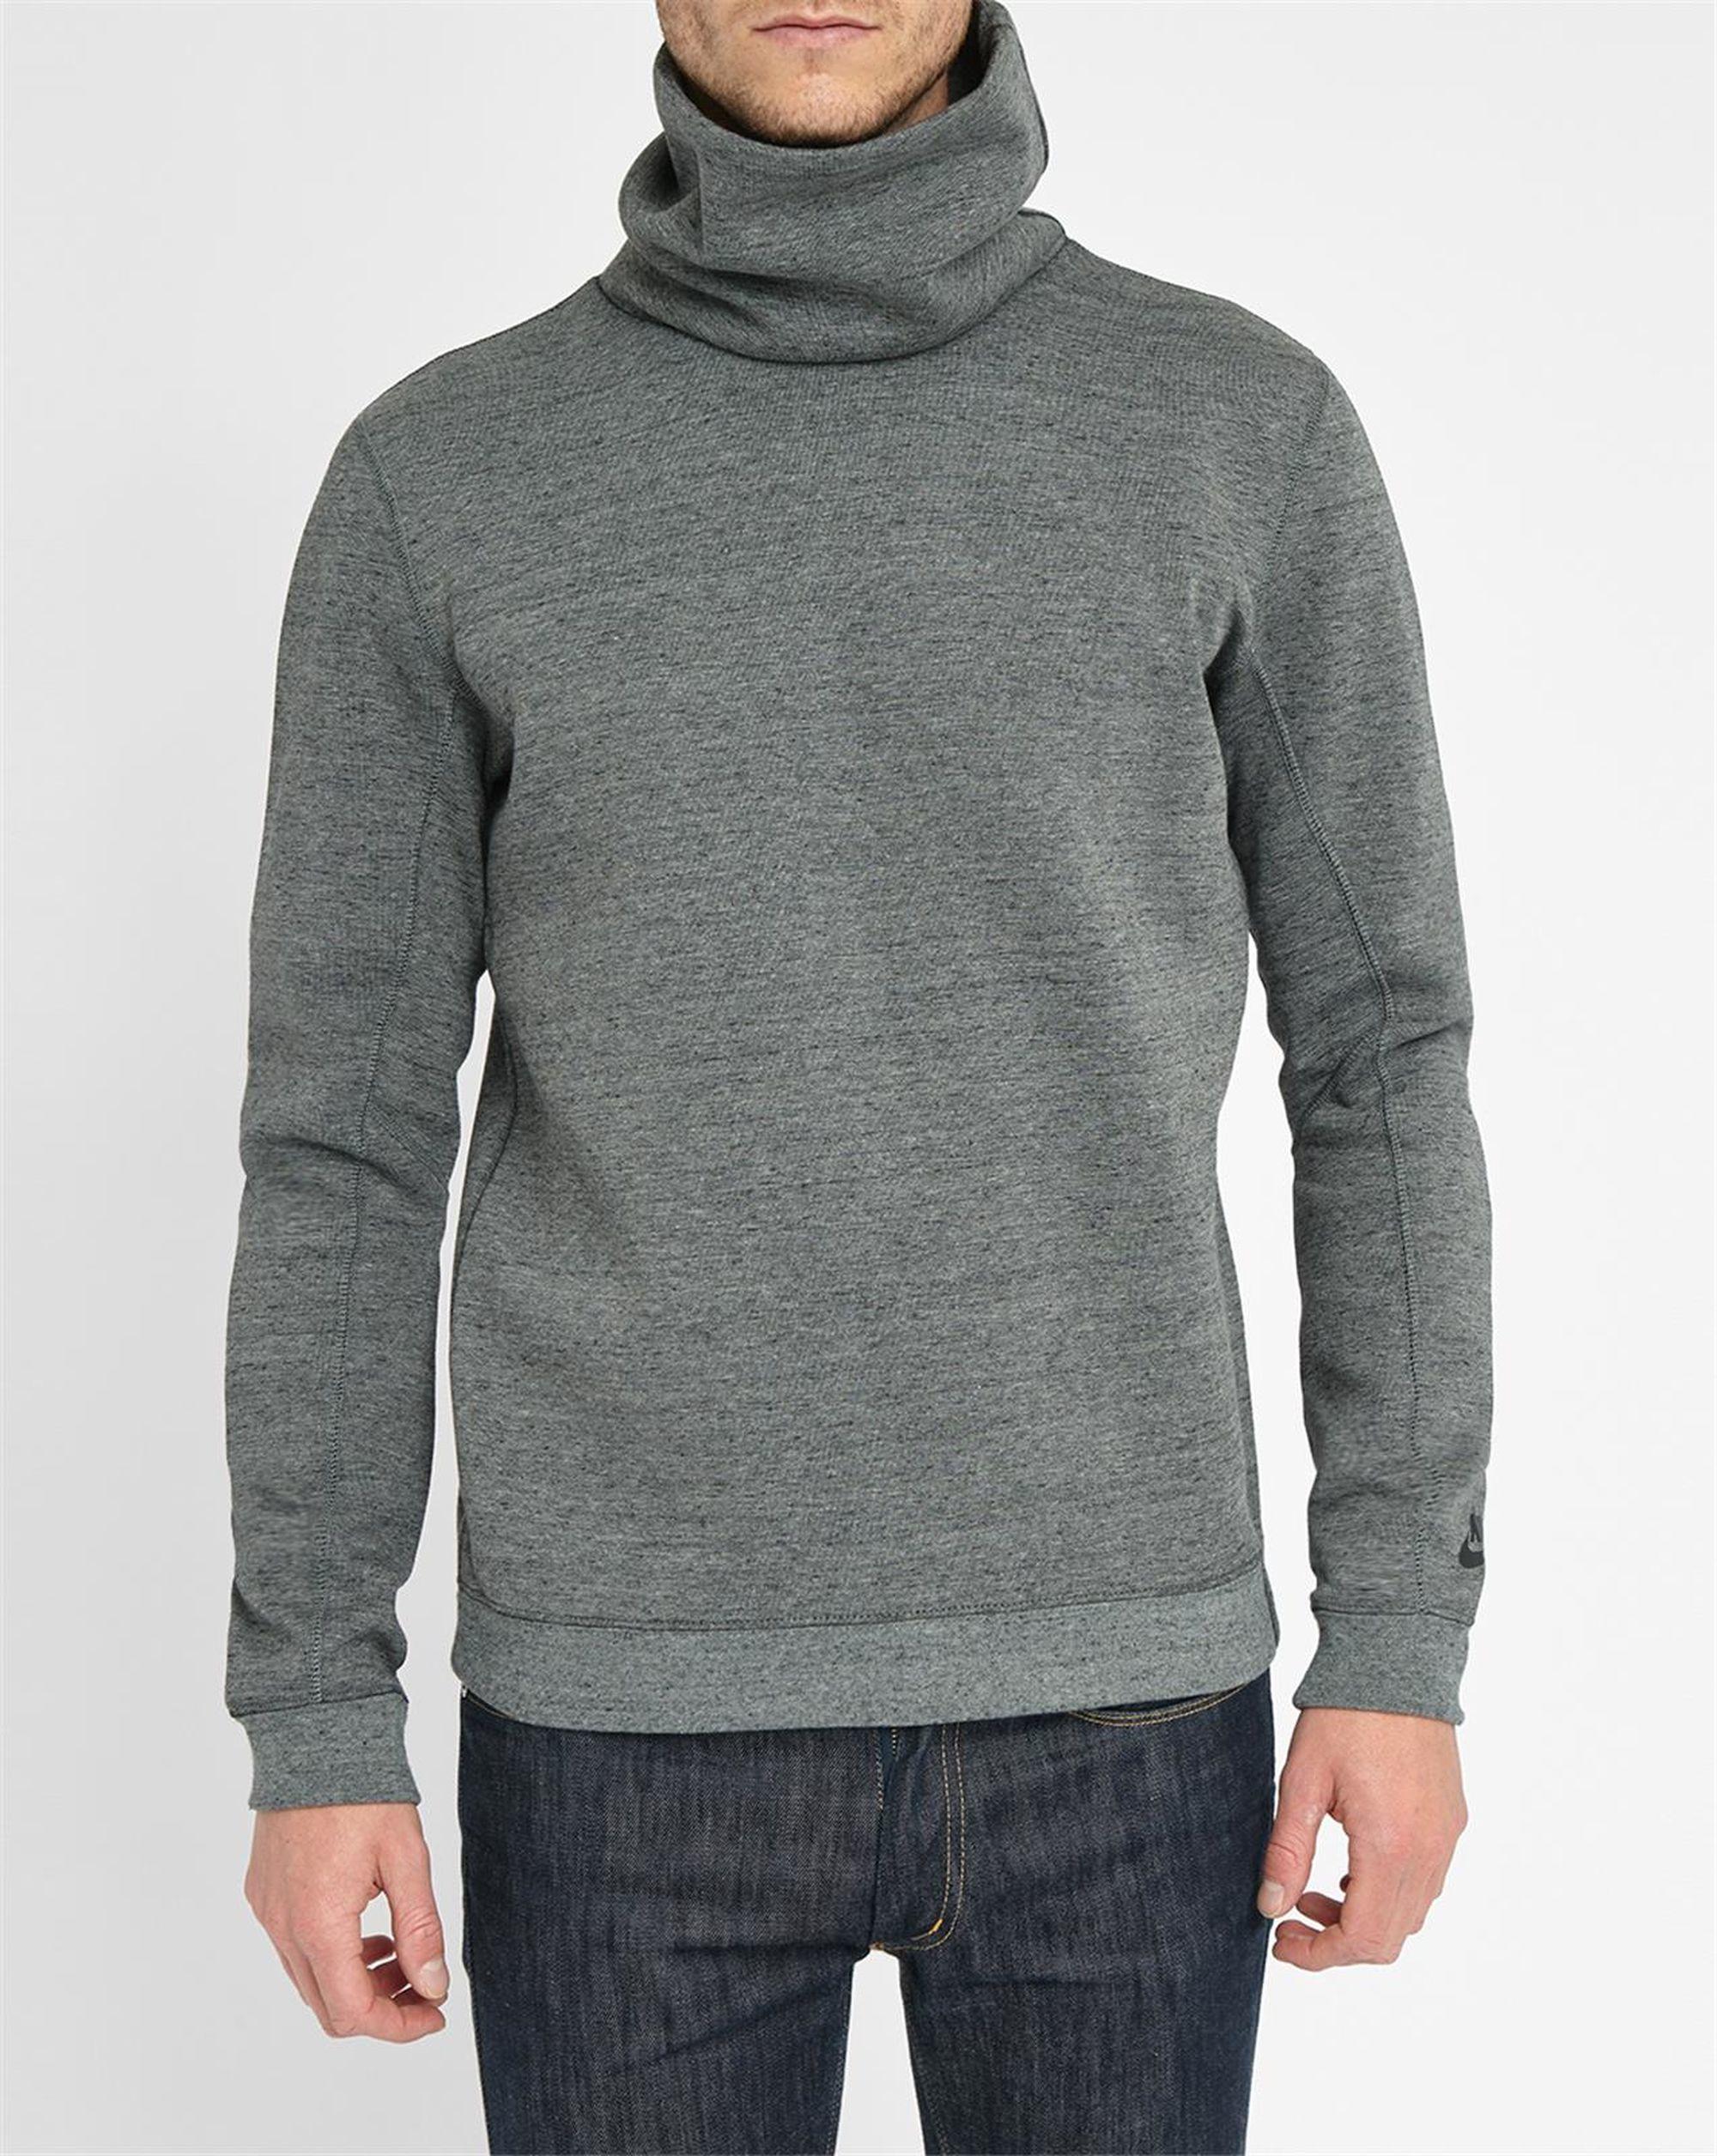 Nike Grey Techfleece Turtleneck Sweatshirt In Gray For Men